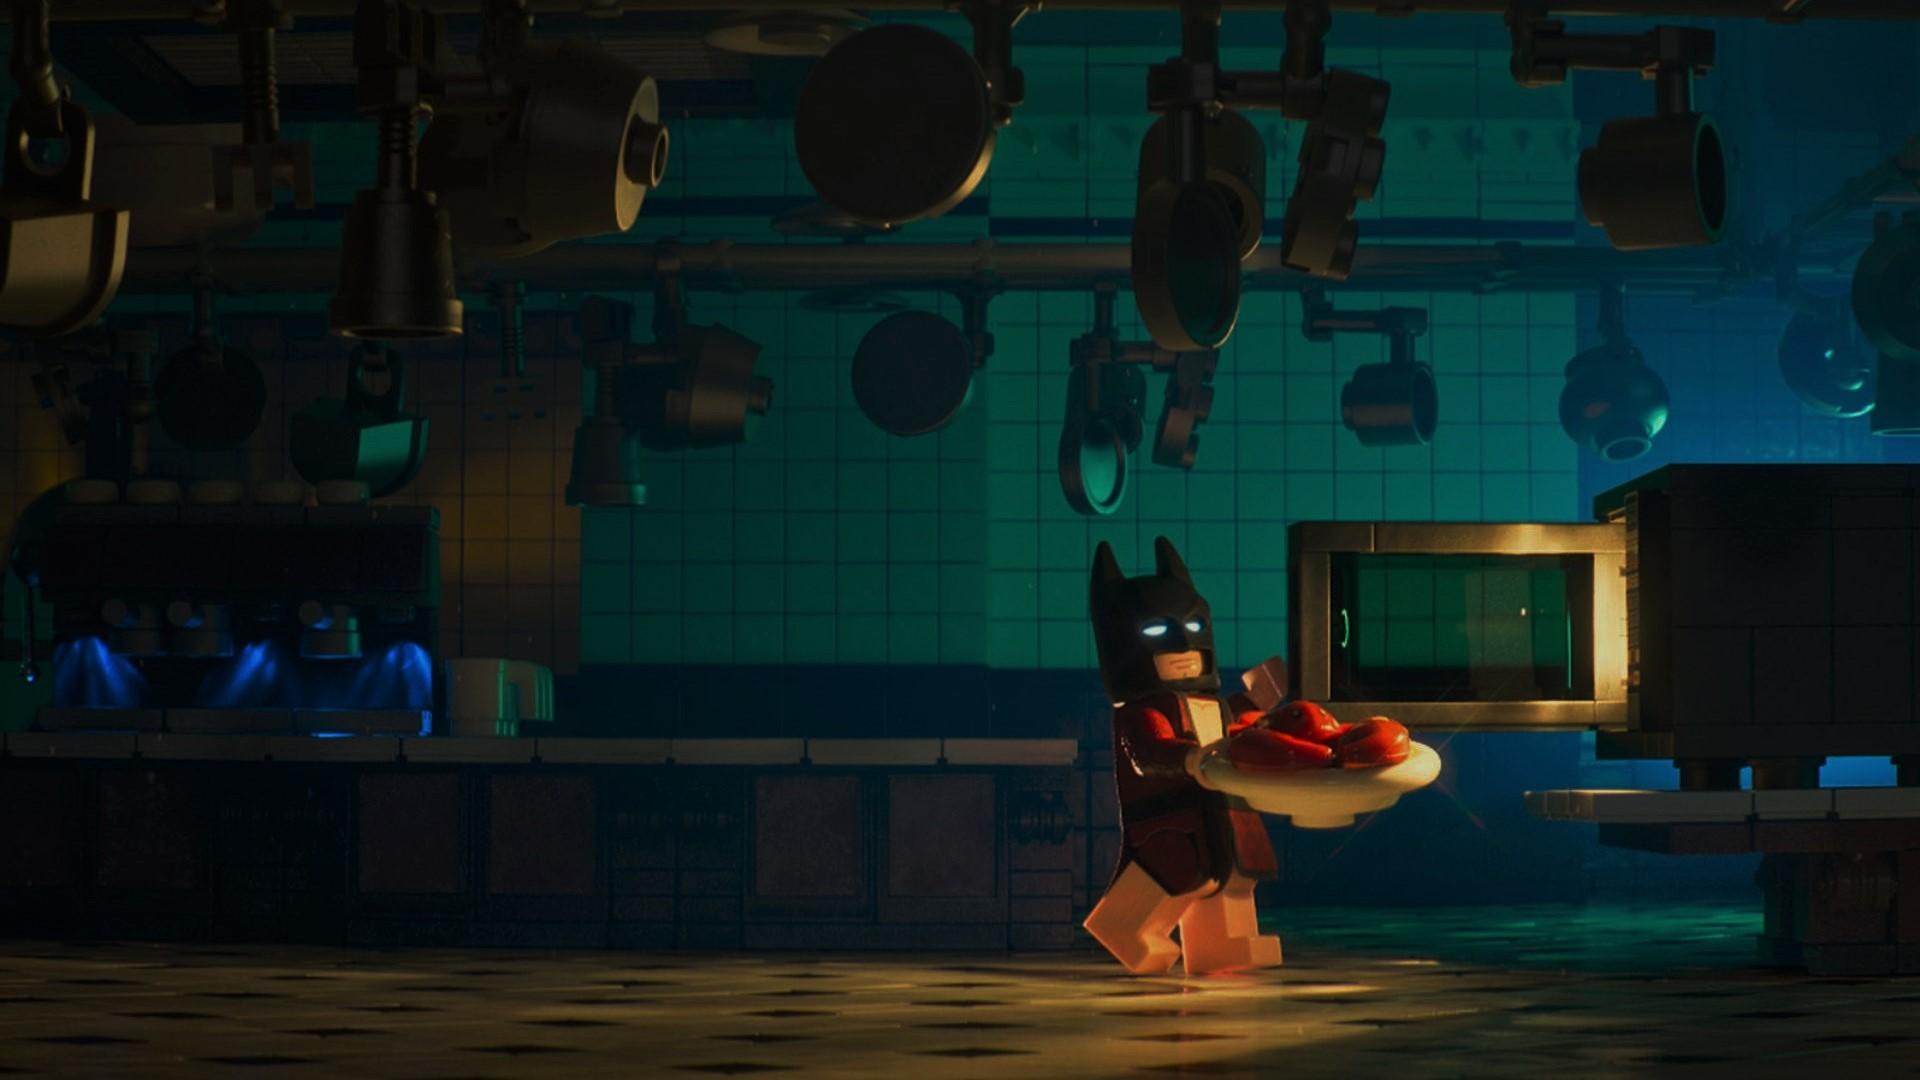 The Lego Batman Movie 2017 - Lobster Thermidor Lego Batman , HD Wallpaper & Backgrounds